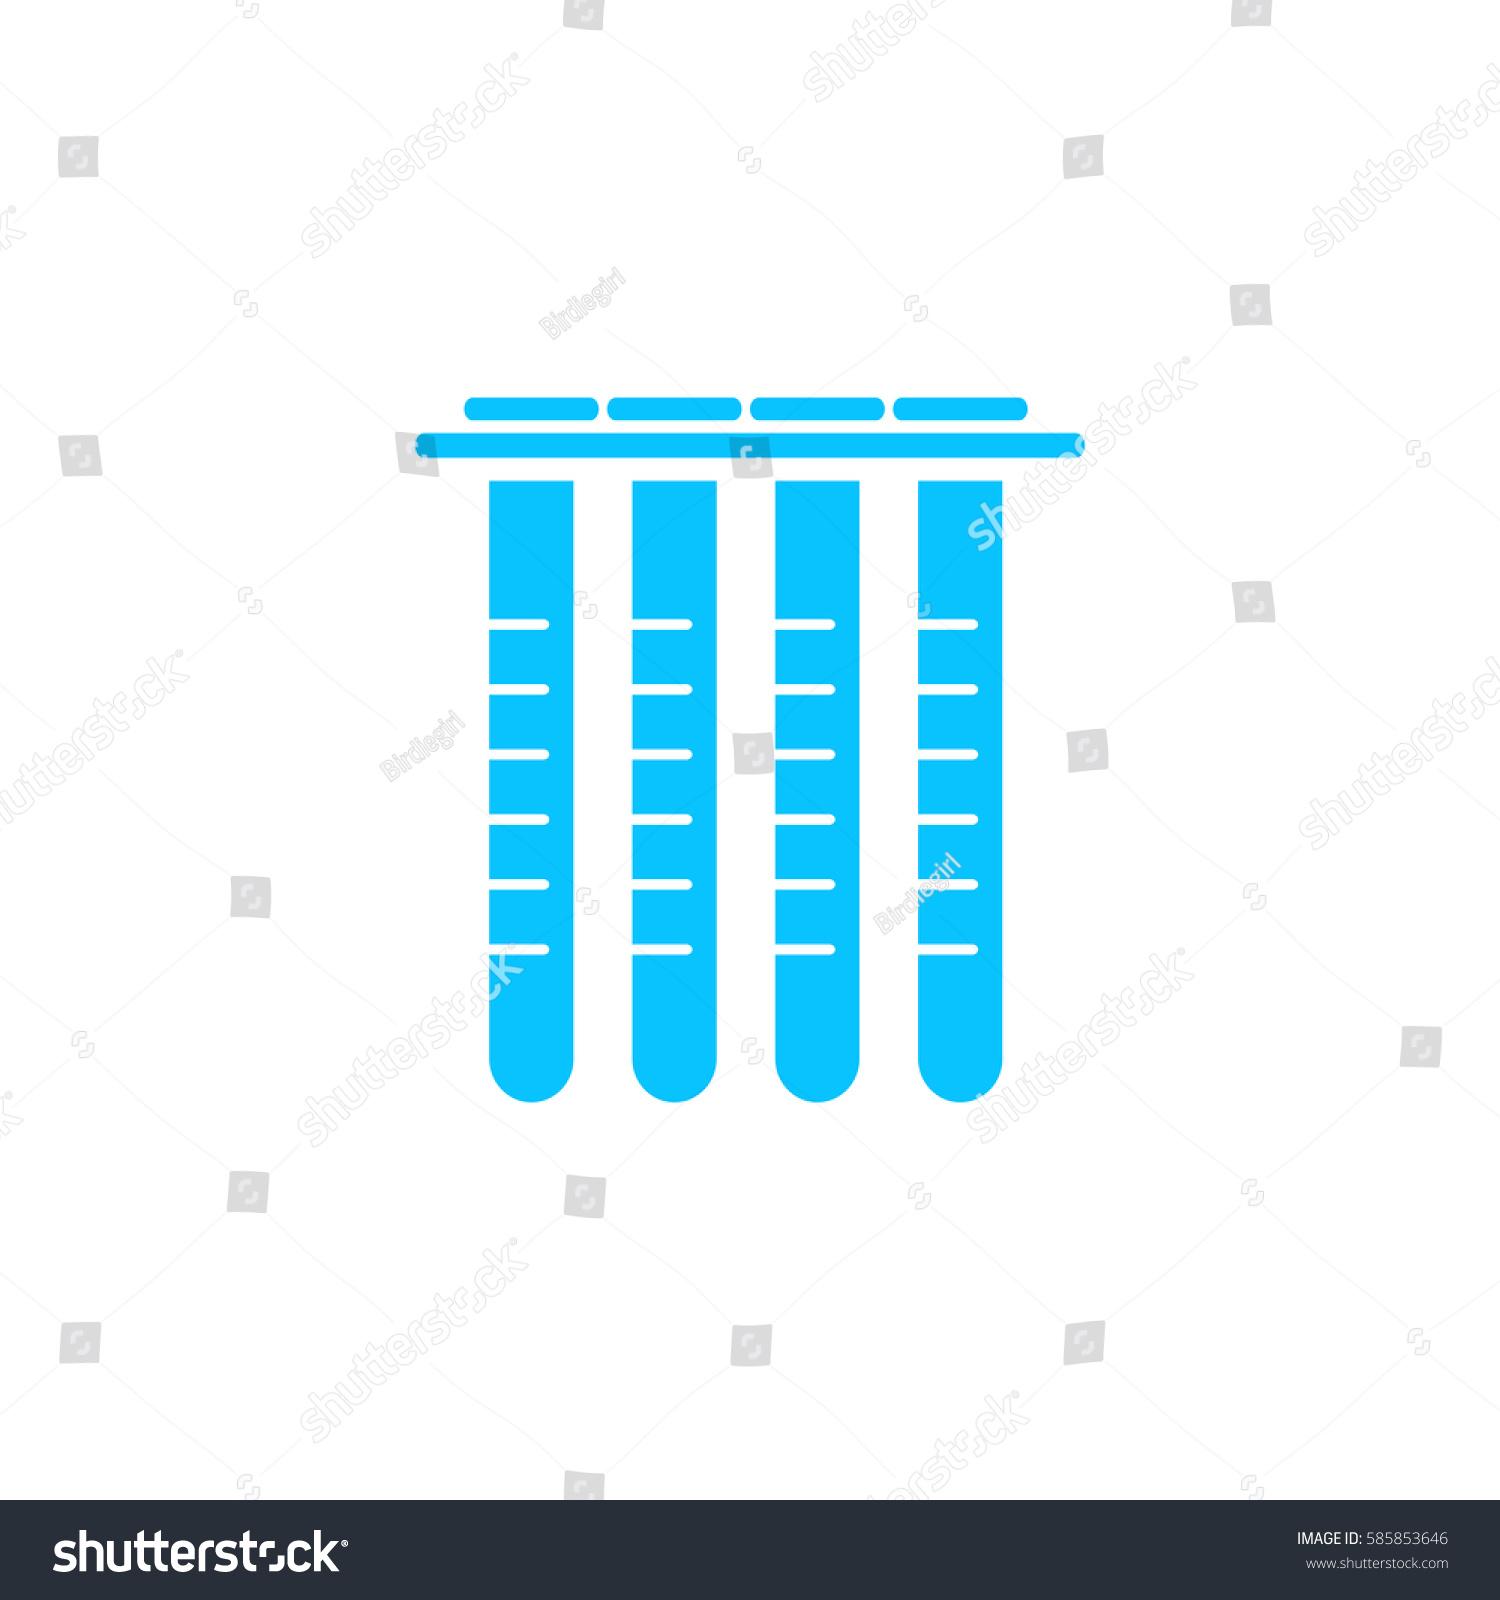 Laboratory Tube Glass Icon Flat Simple Stock Illustration 585853646